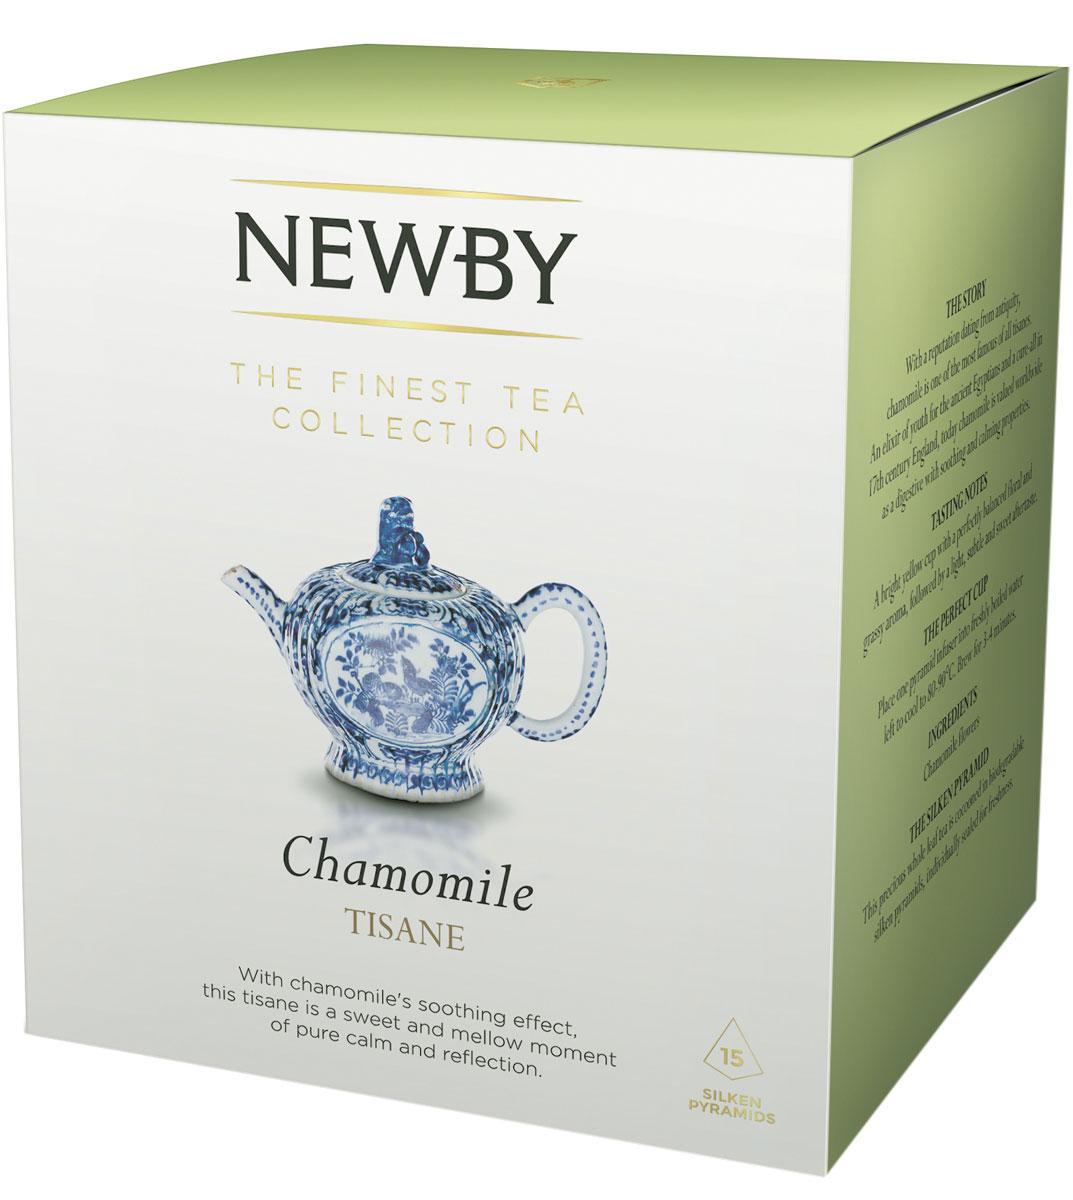 Newby Chamomile травяной чай в пирамидках, 15 шт newby hi chung зеленый листовой чай 125 г